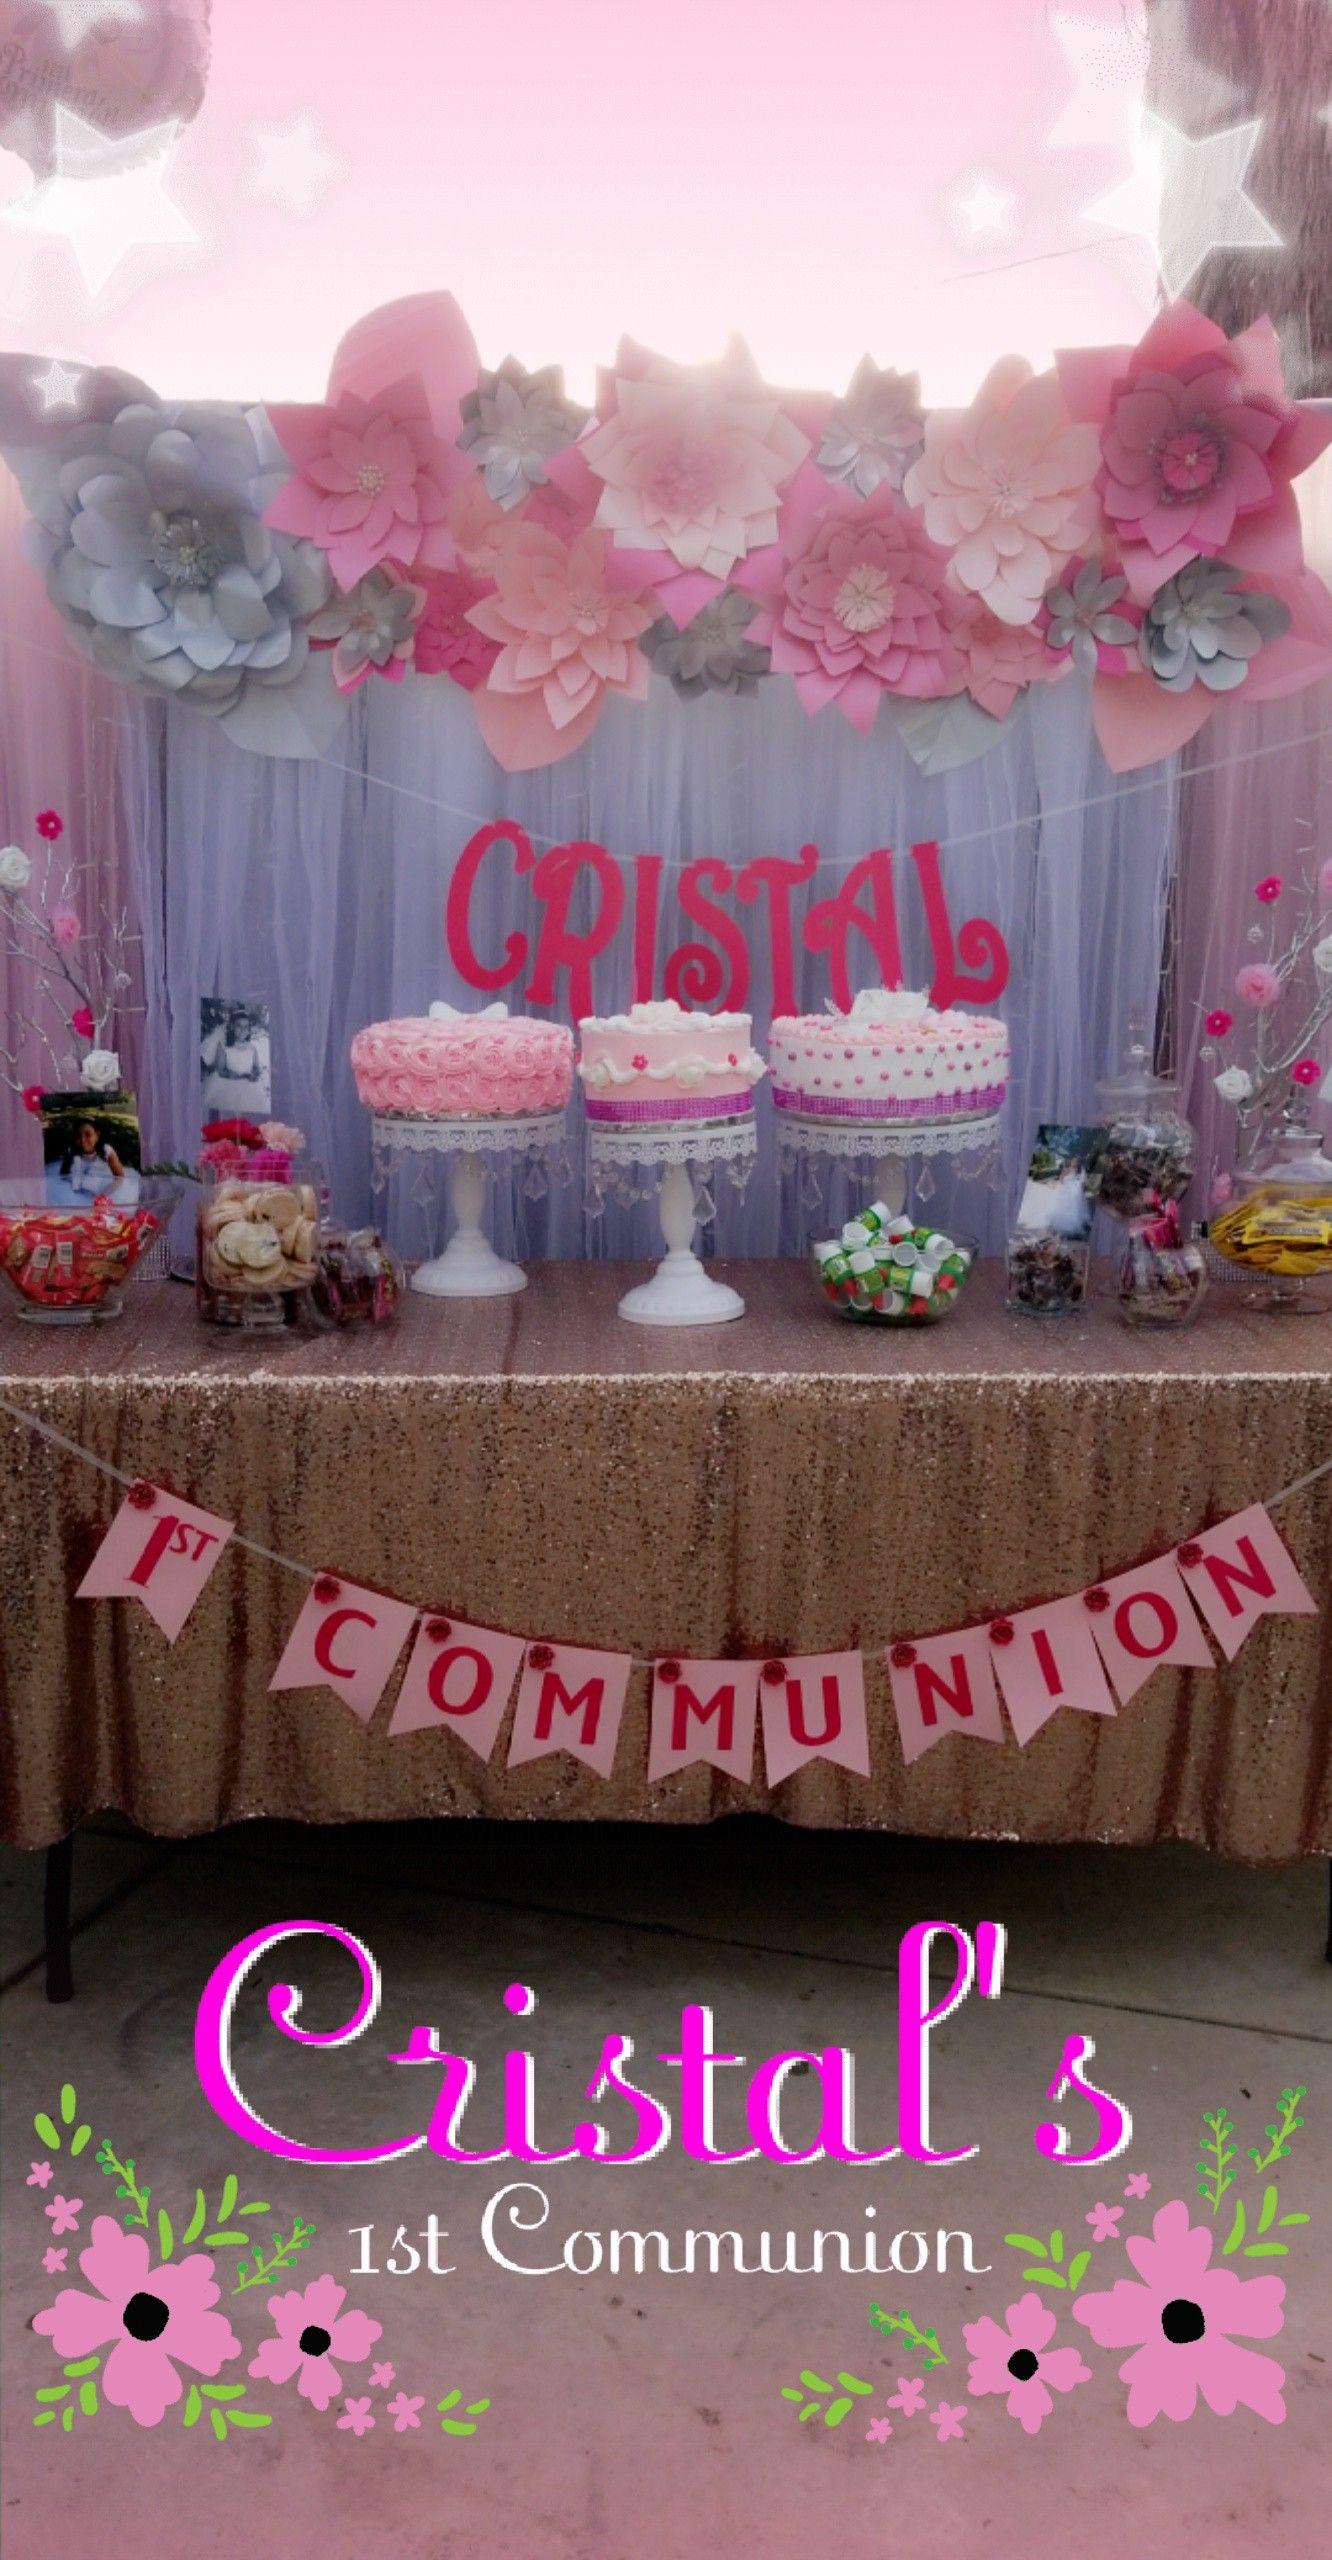 1st Communion Candy Table Fist Communion Party 1st Communion Decorations First Communion Back Communion Decorations First Communion Party Communion Party